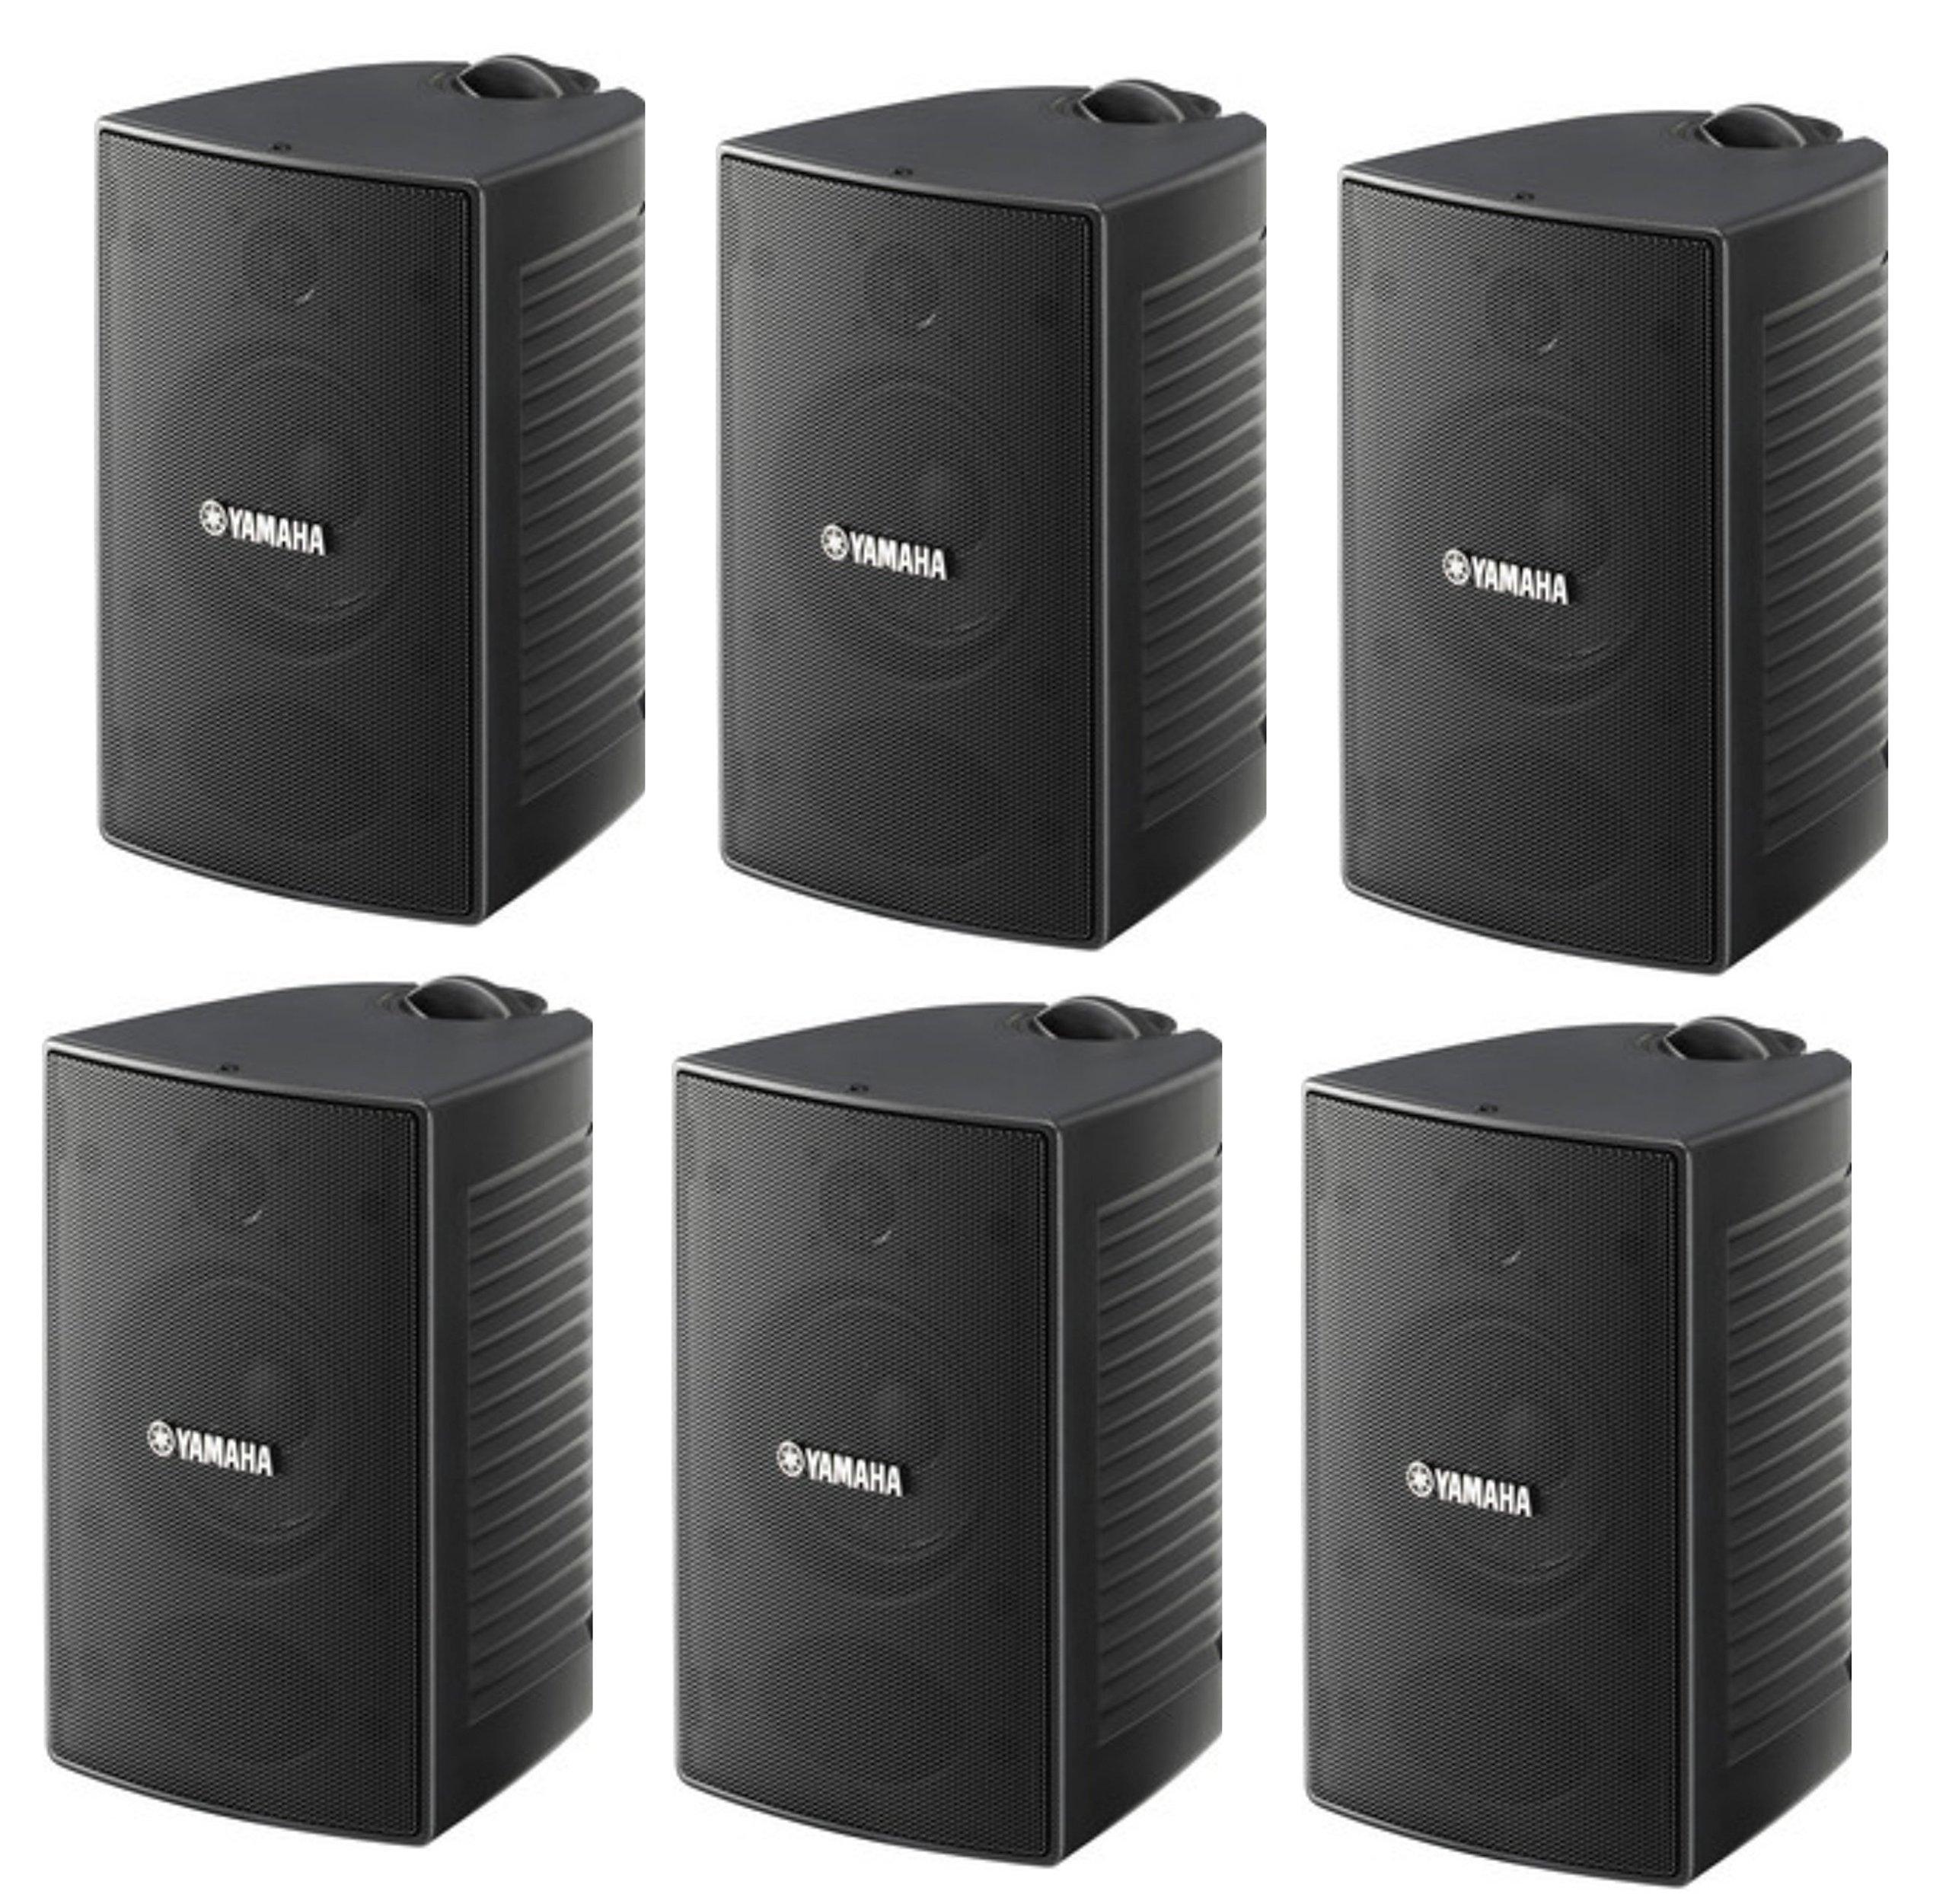 Yamaha High-Performance Natural Surround Sound 2-Way Indoor/Outdoor Weatherproof Home Theater Speakers (Set Of 6)